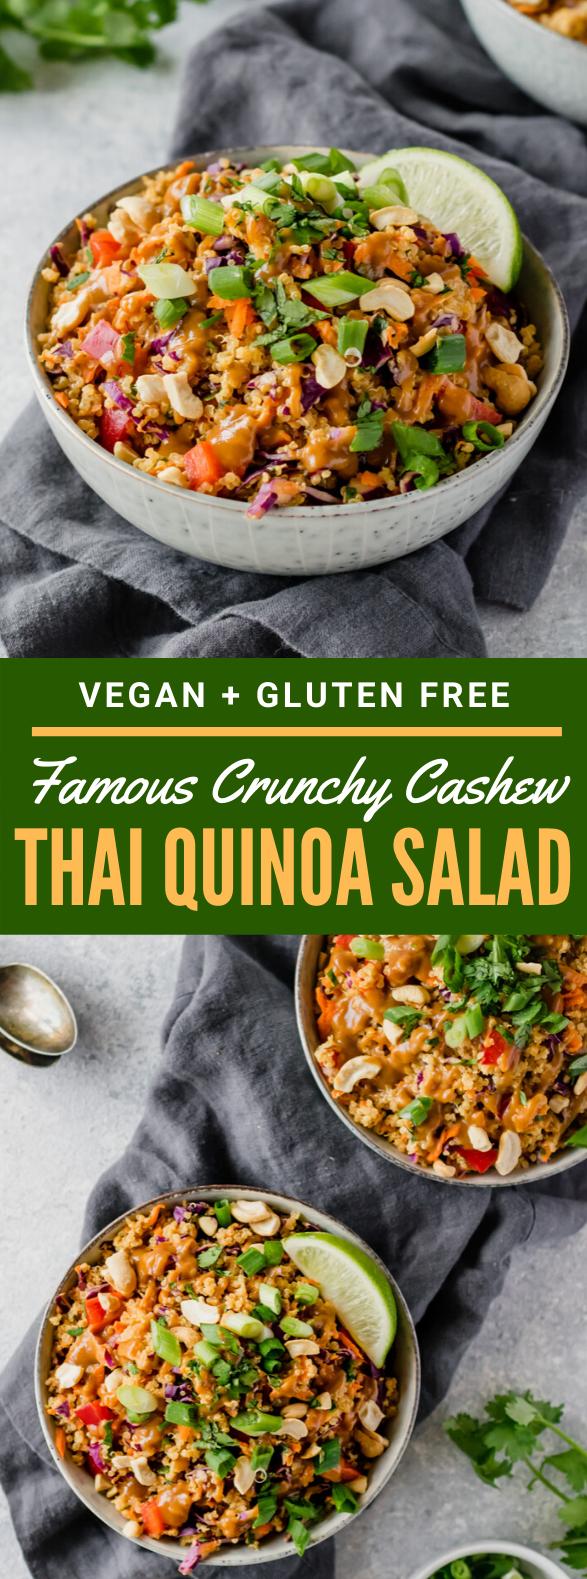 Famous Crunchy Cashew Thai Quinoa Salad {vegan & gluten-free} #vegetarian #lunch